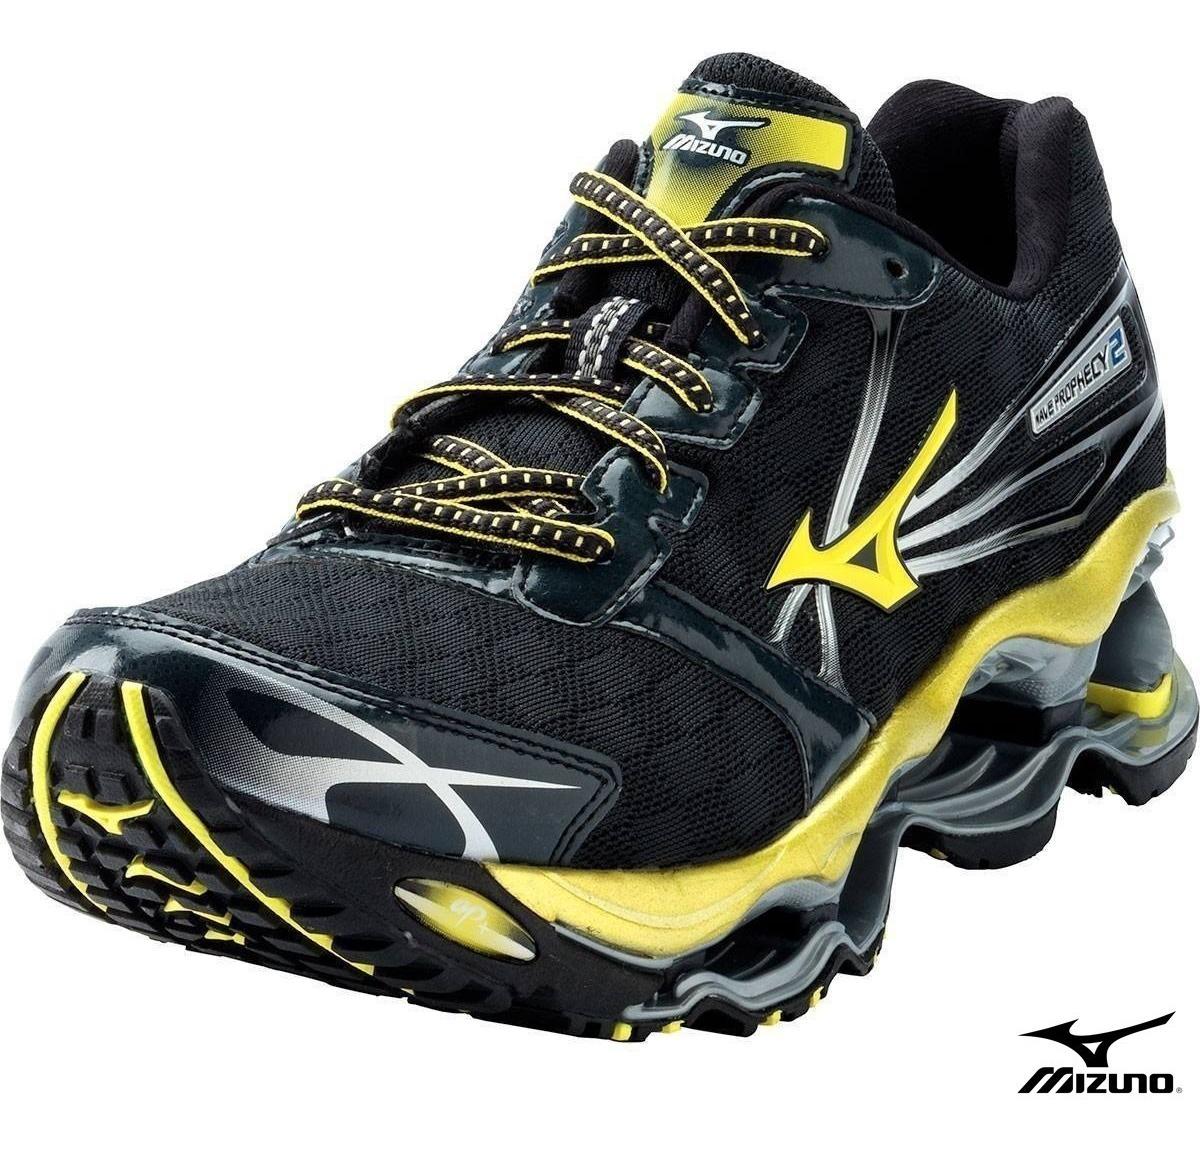 separation shoes 927d1 8c259 Tenis Mizuno Wave Prophecy 2 Masculino Importado